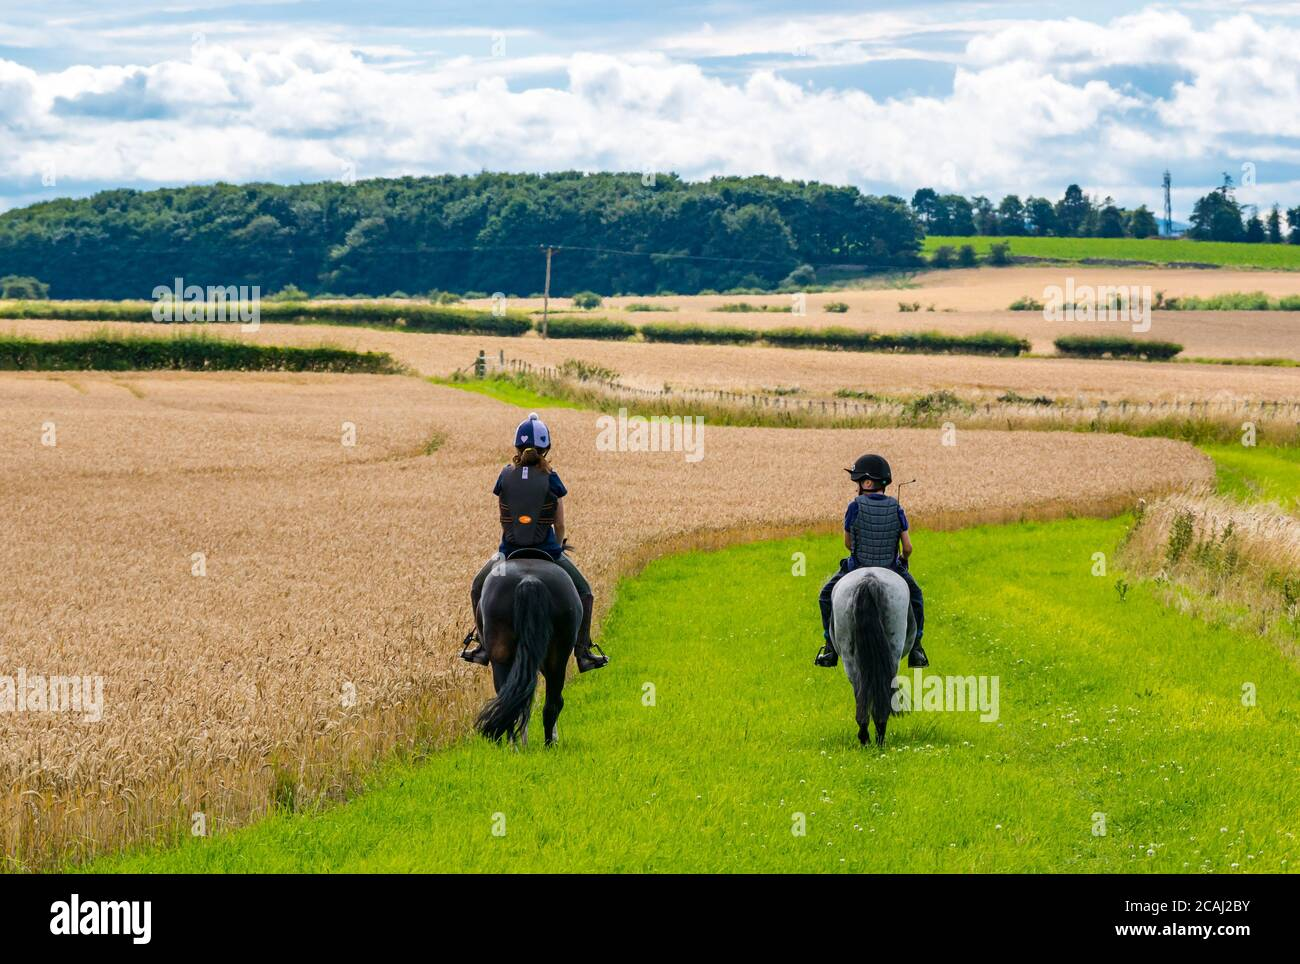 east-lothian-scotland-united-kingdom-7th